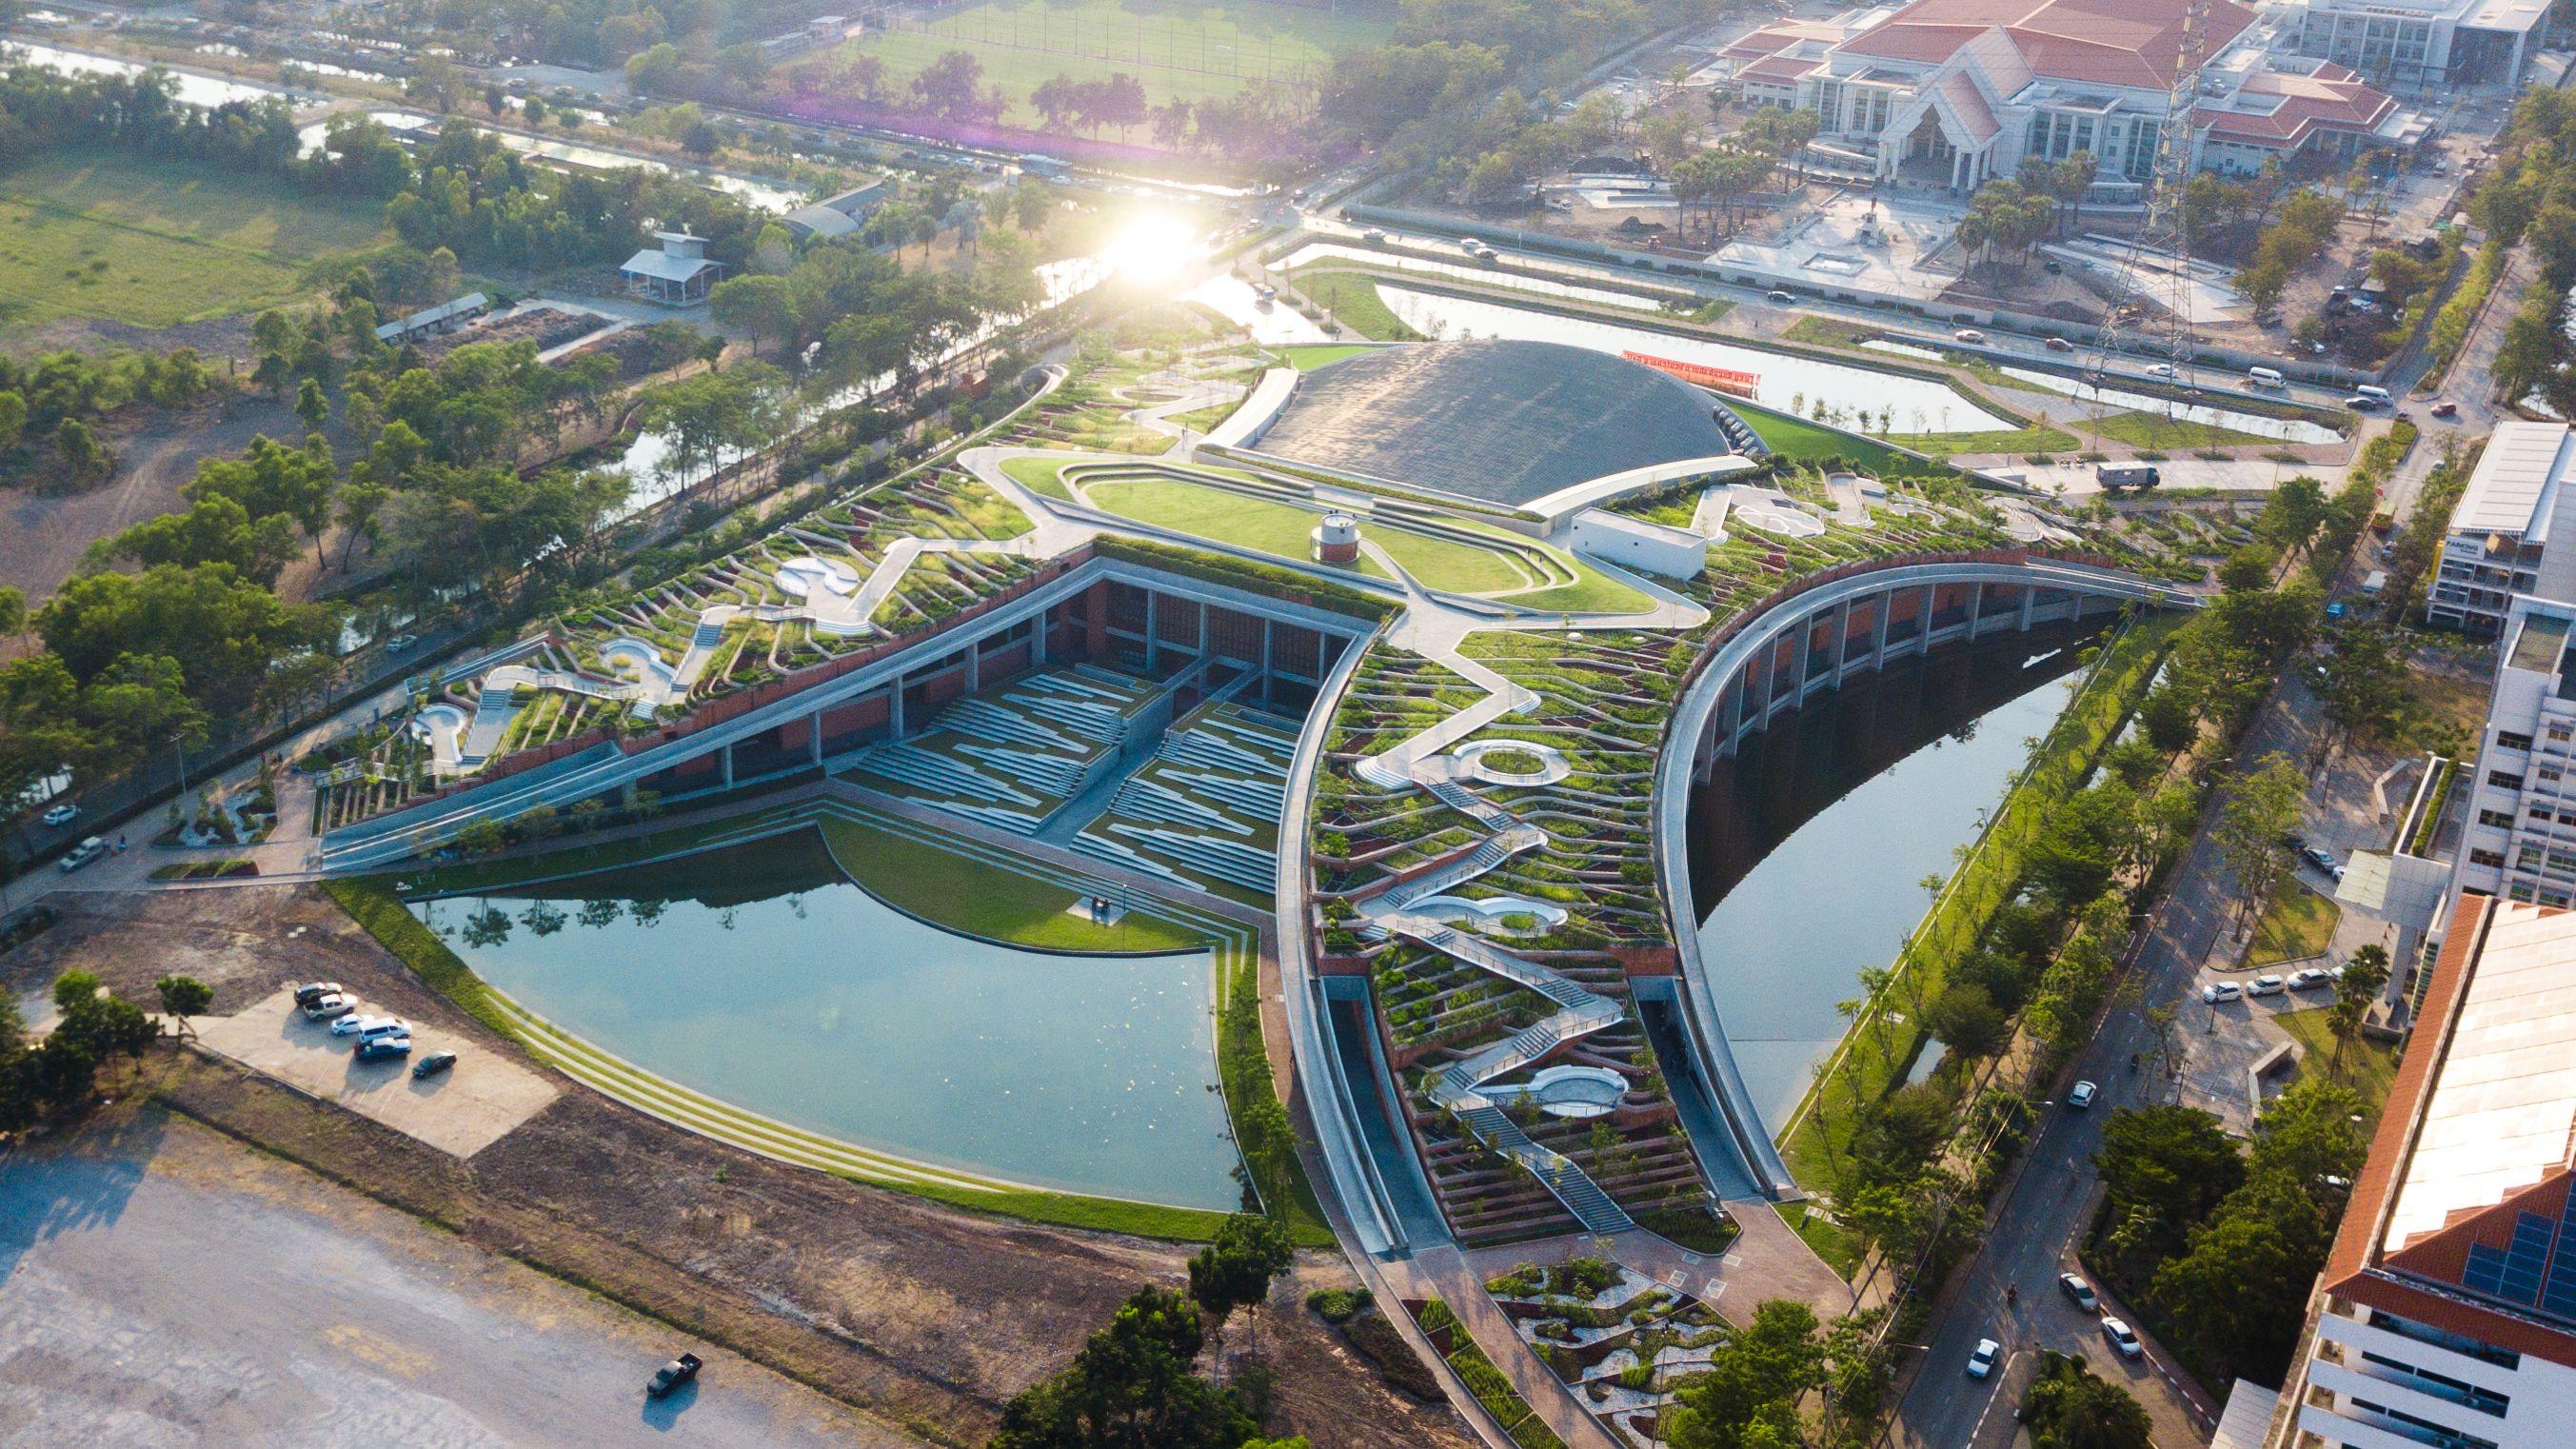 Thammasat Urban Farm Rooftop, vencedor Landscape Design of the Year / architectureprize.com